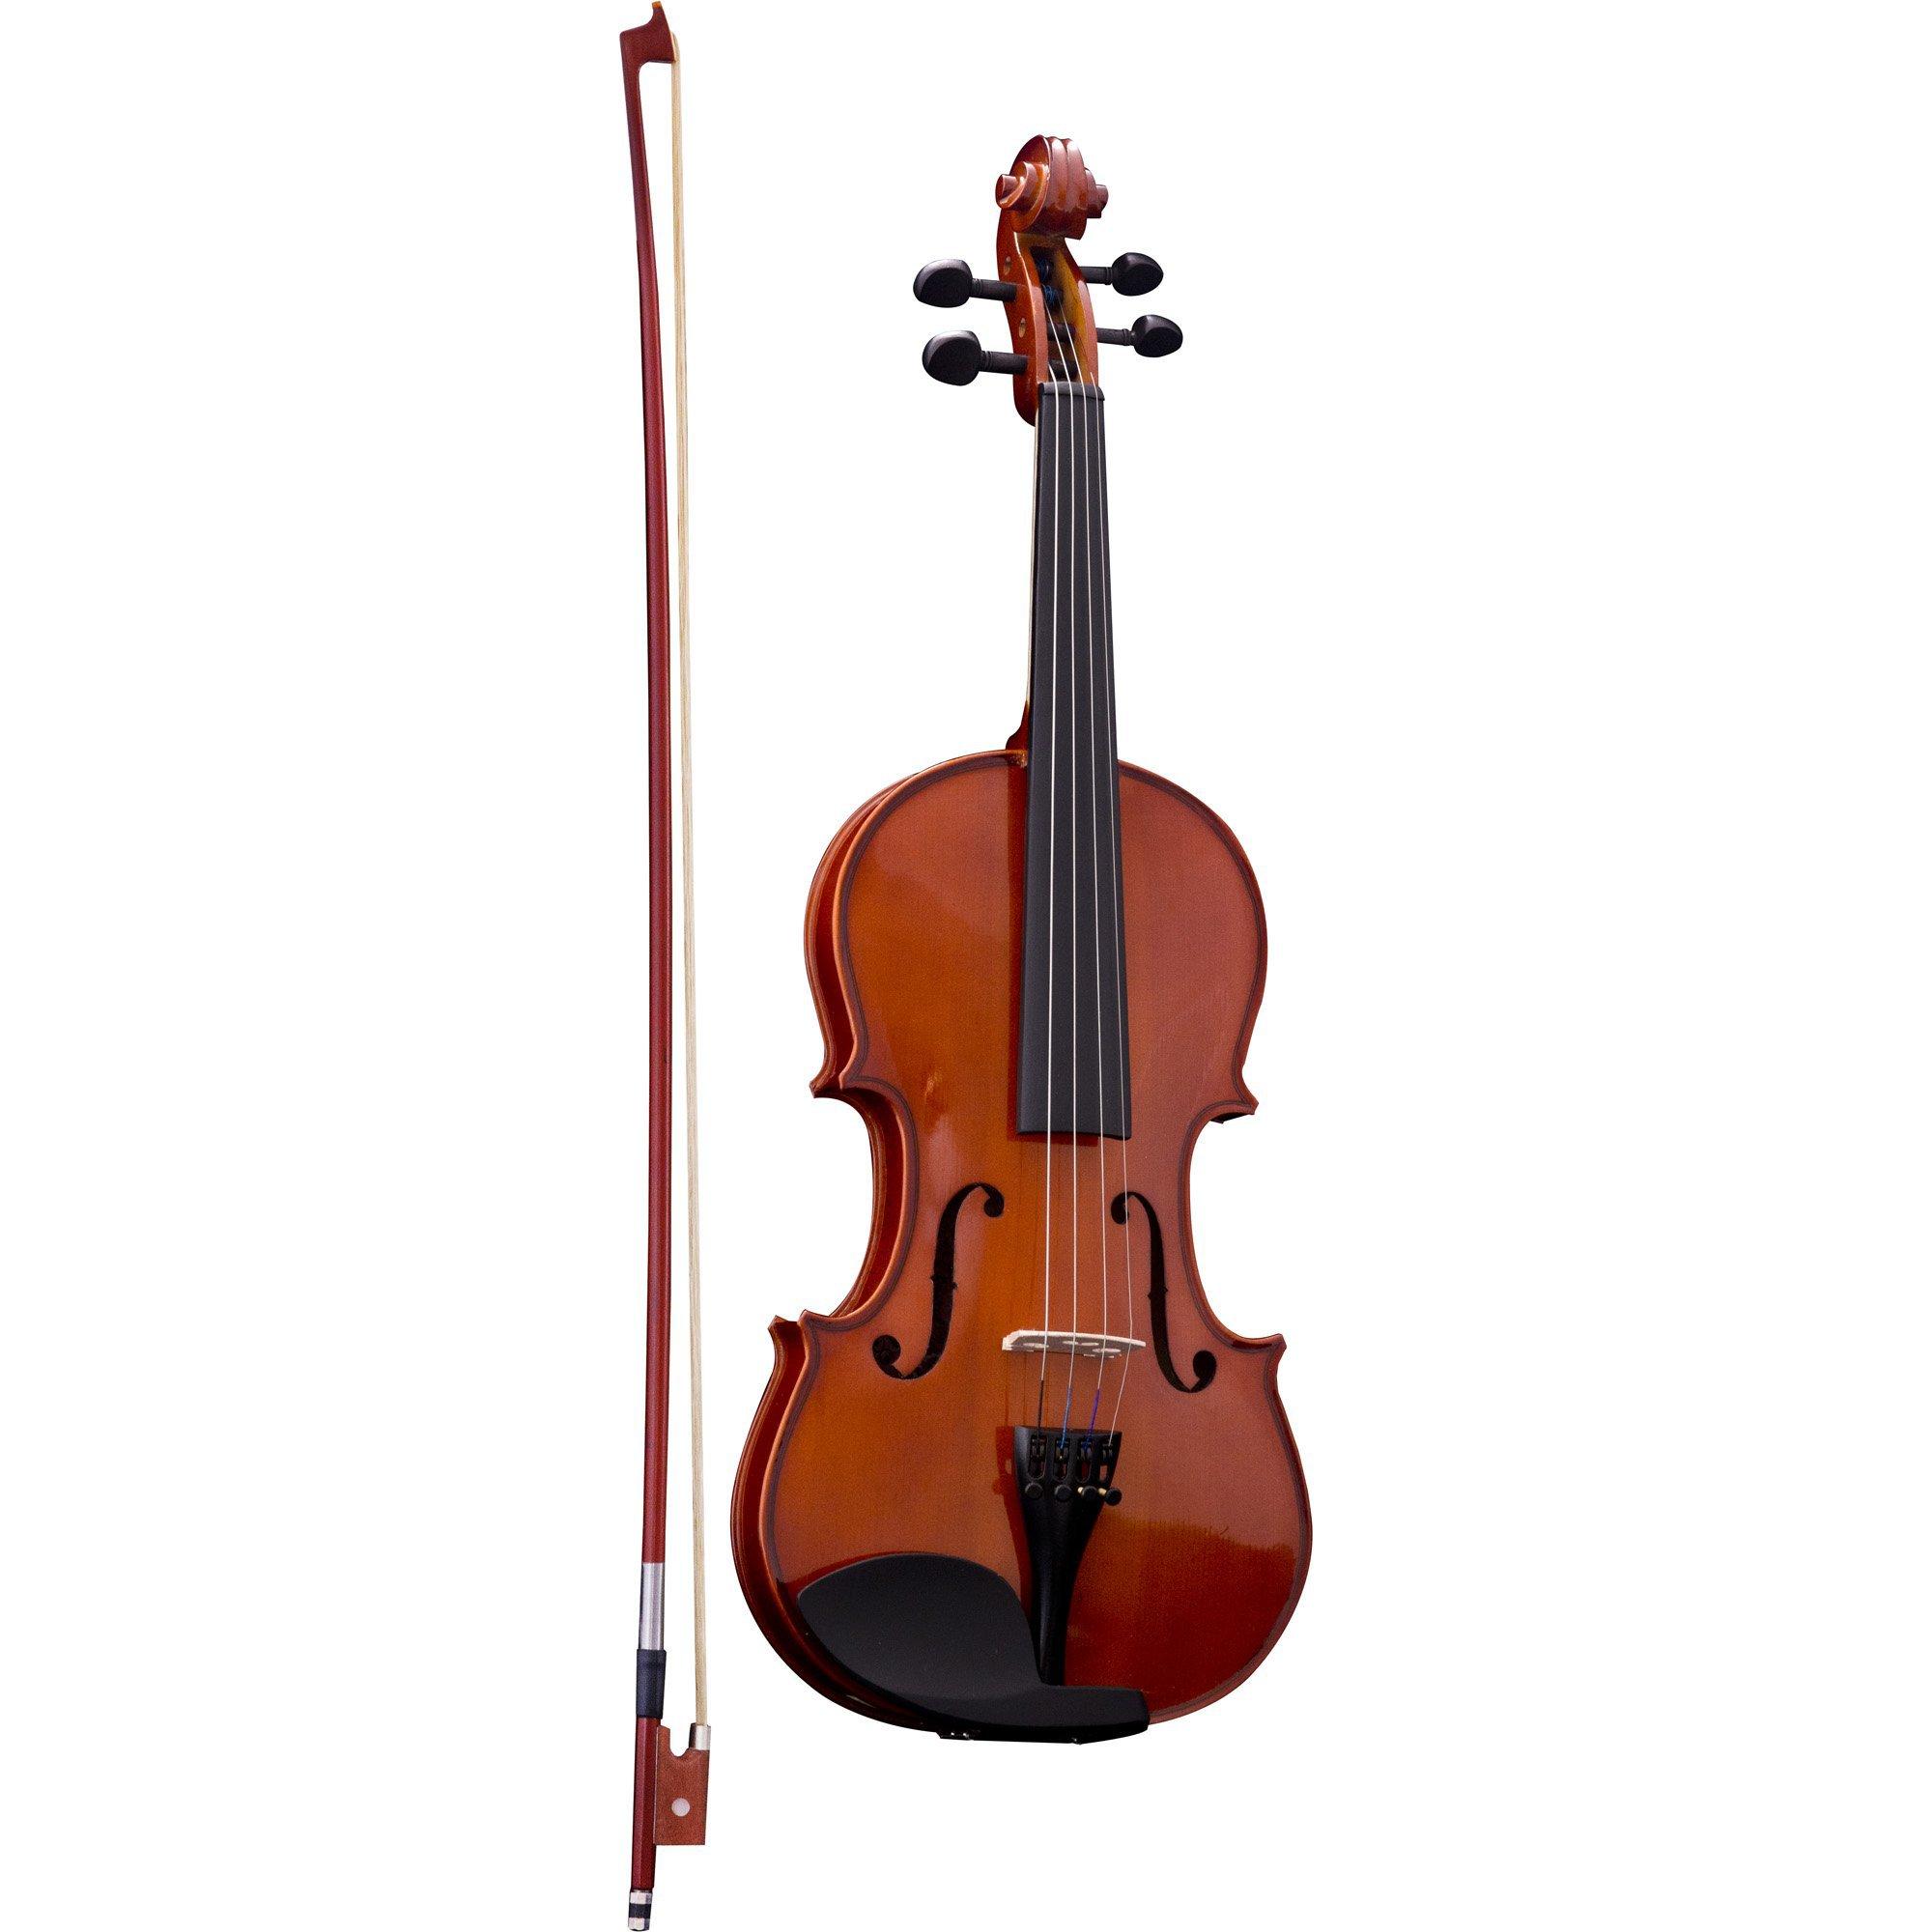 violino 4 4 va 10 oportunidade natural harmonics 42888 2000 181305